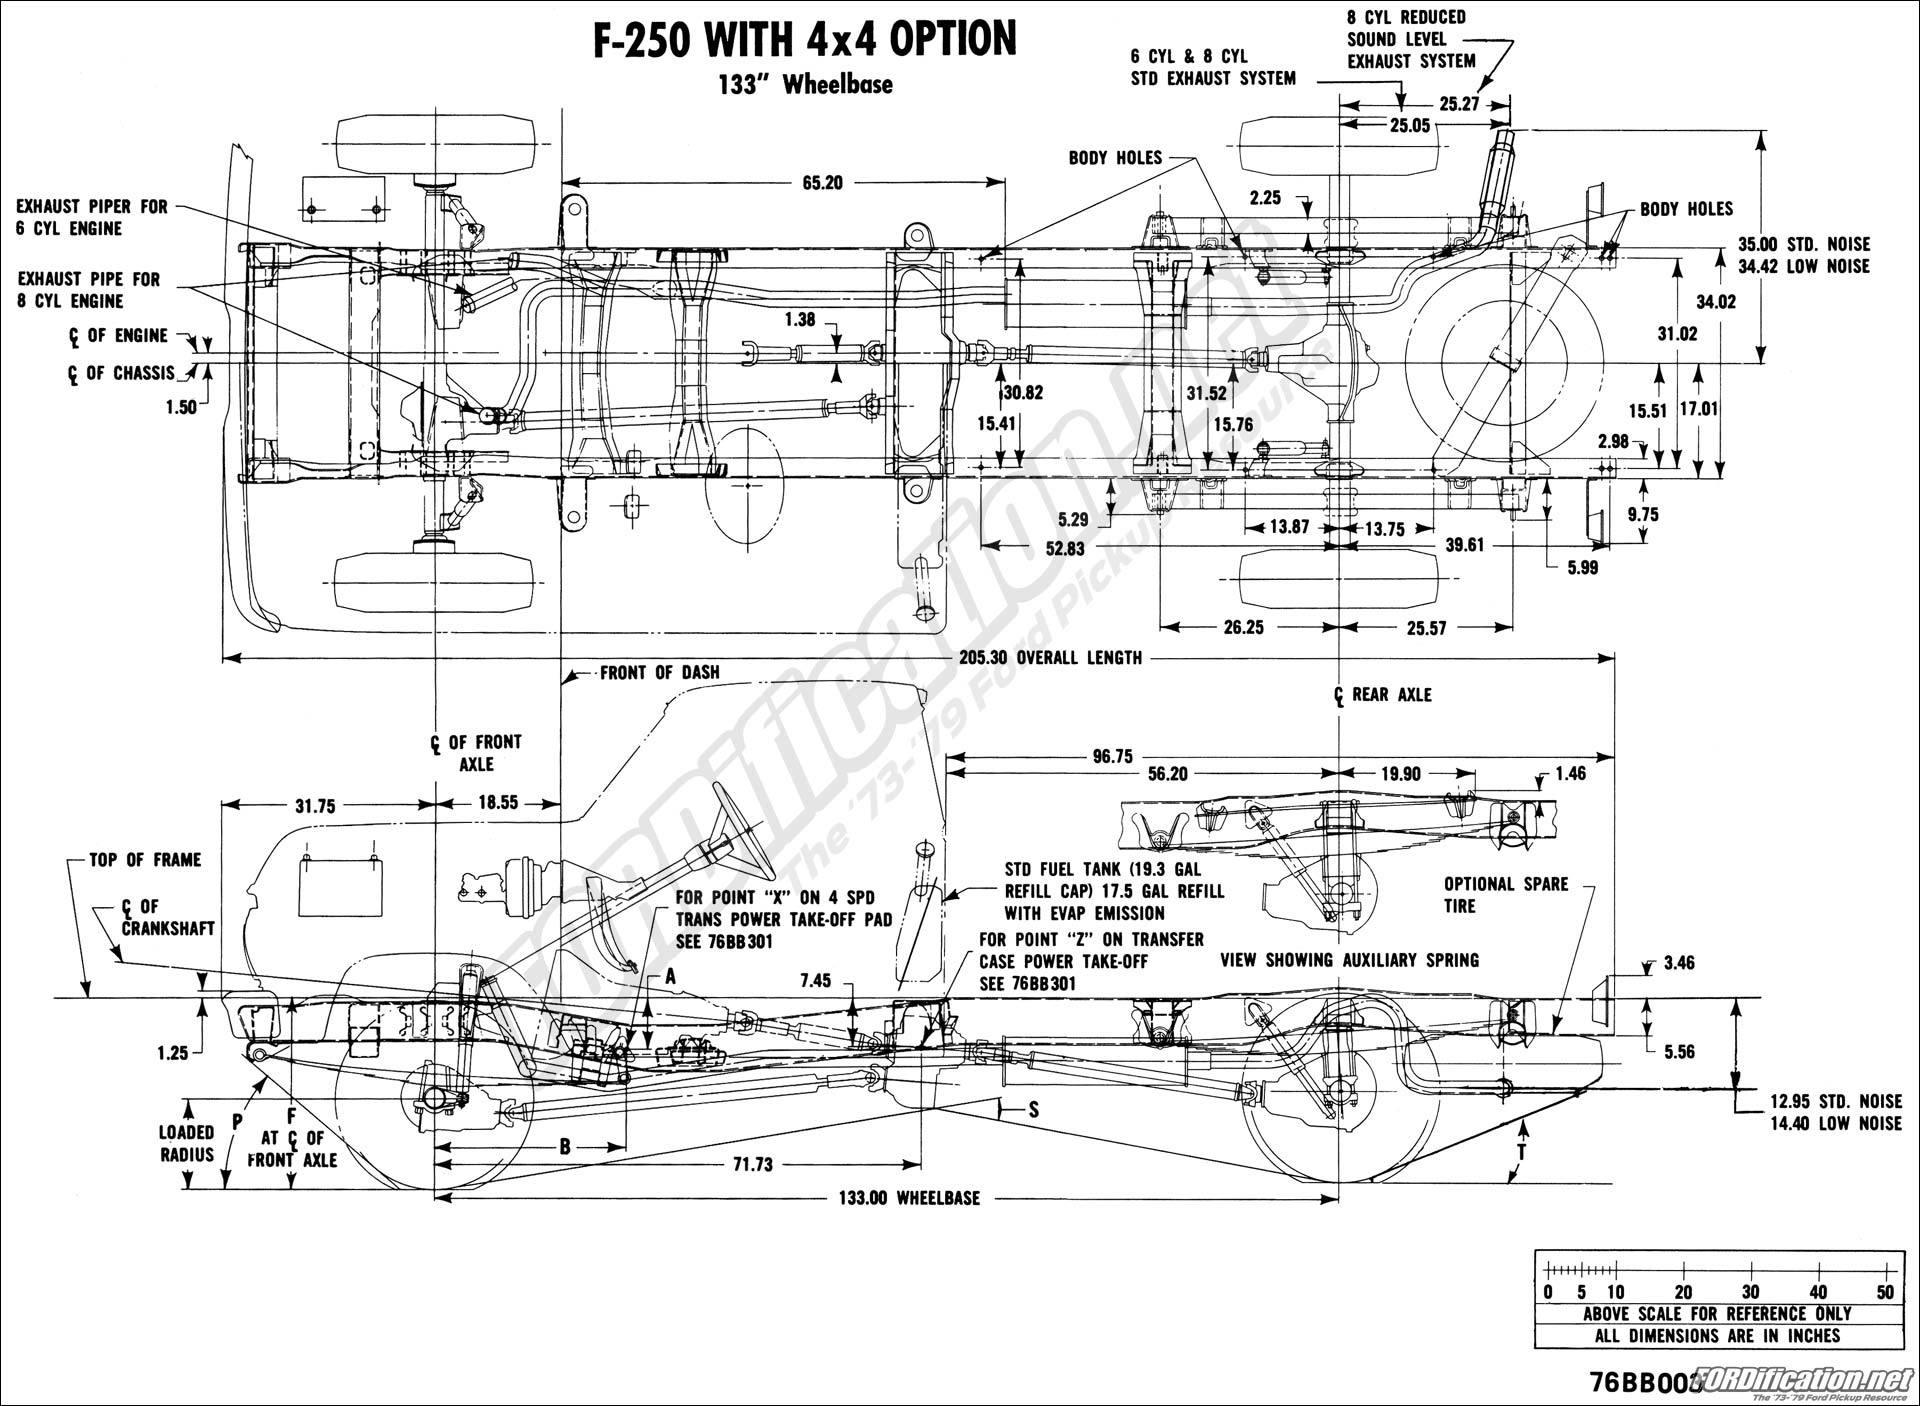 Bronco78idi S Bronco Idi Turbo Swap Fabrication Lots